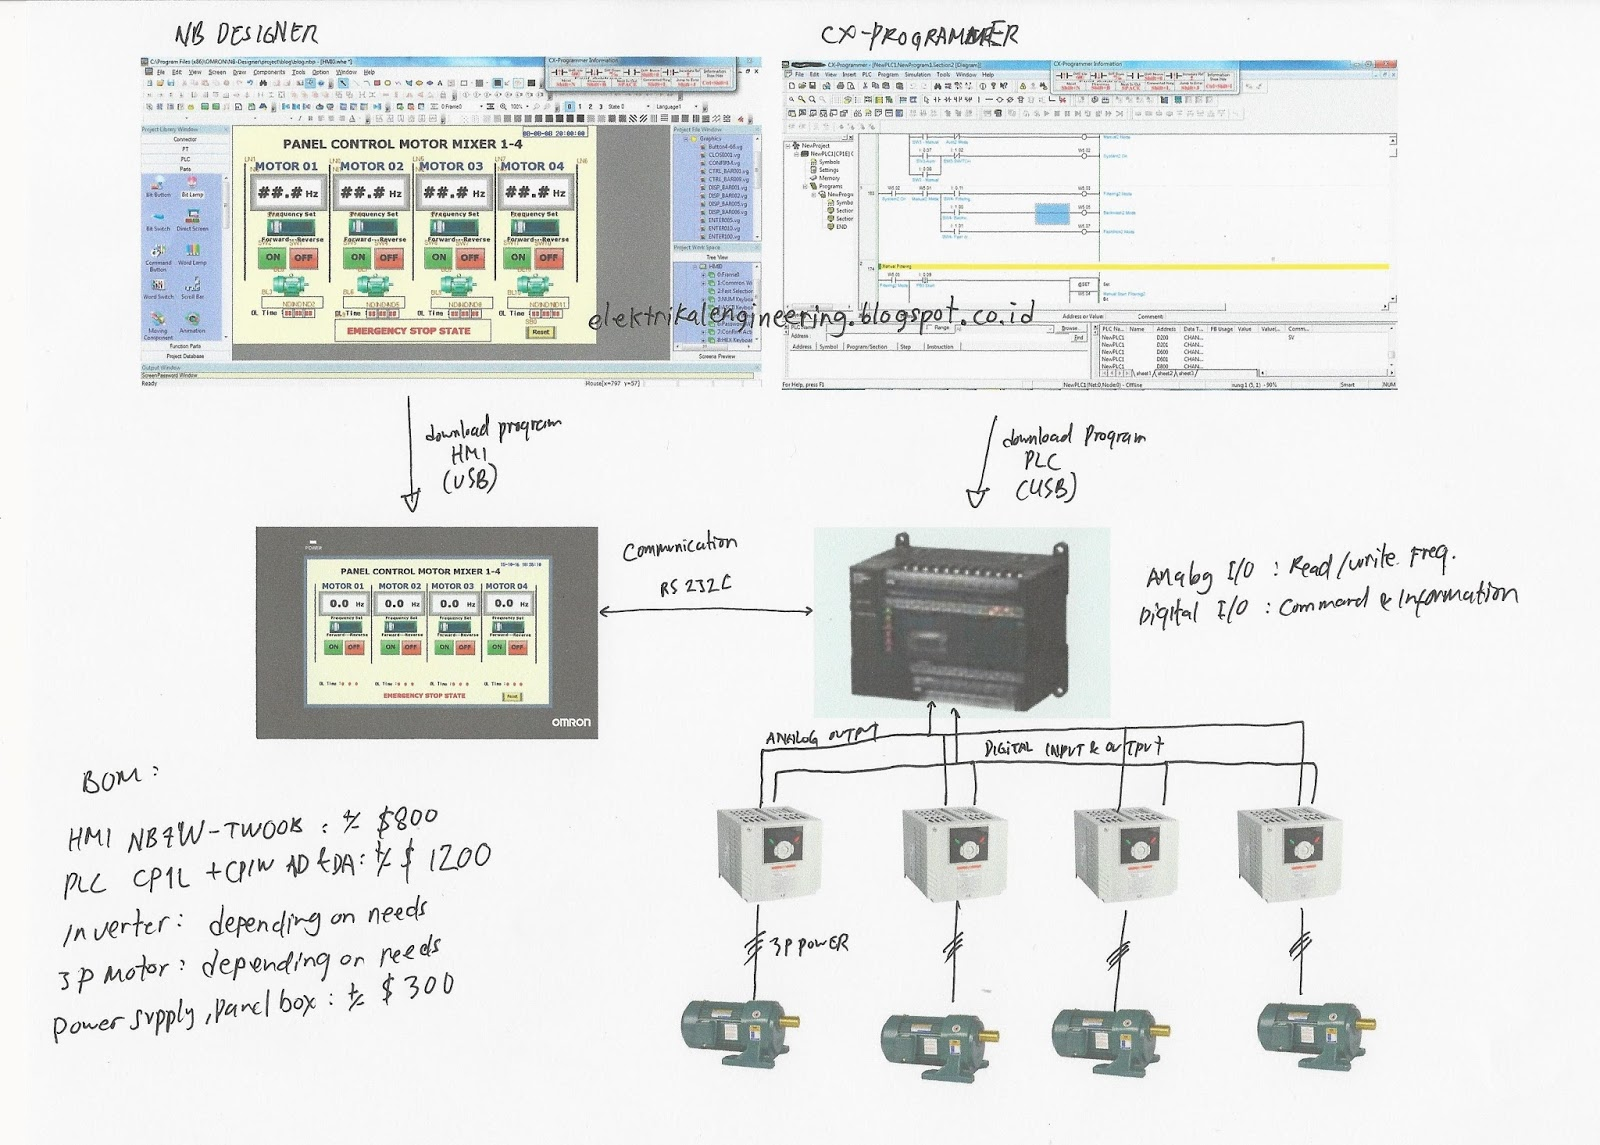 elektrikal engineer: Wiring Diagram Inverter LS & PLC and